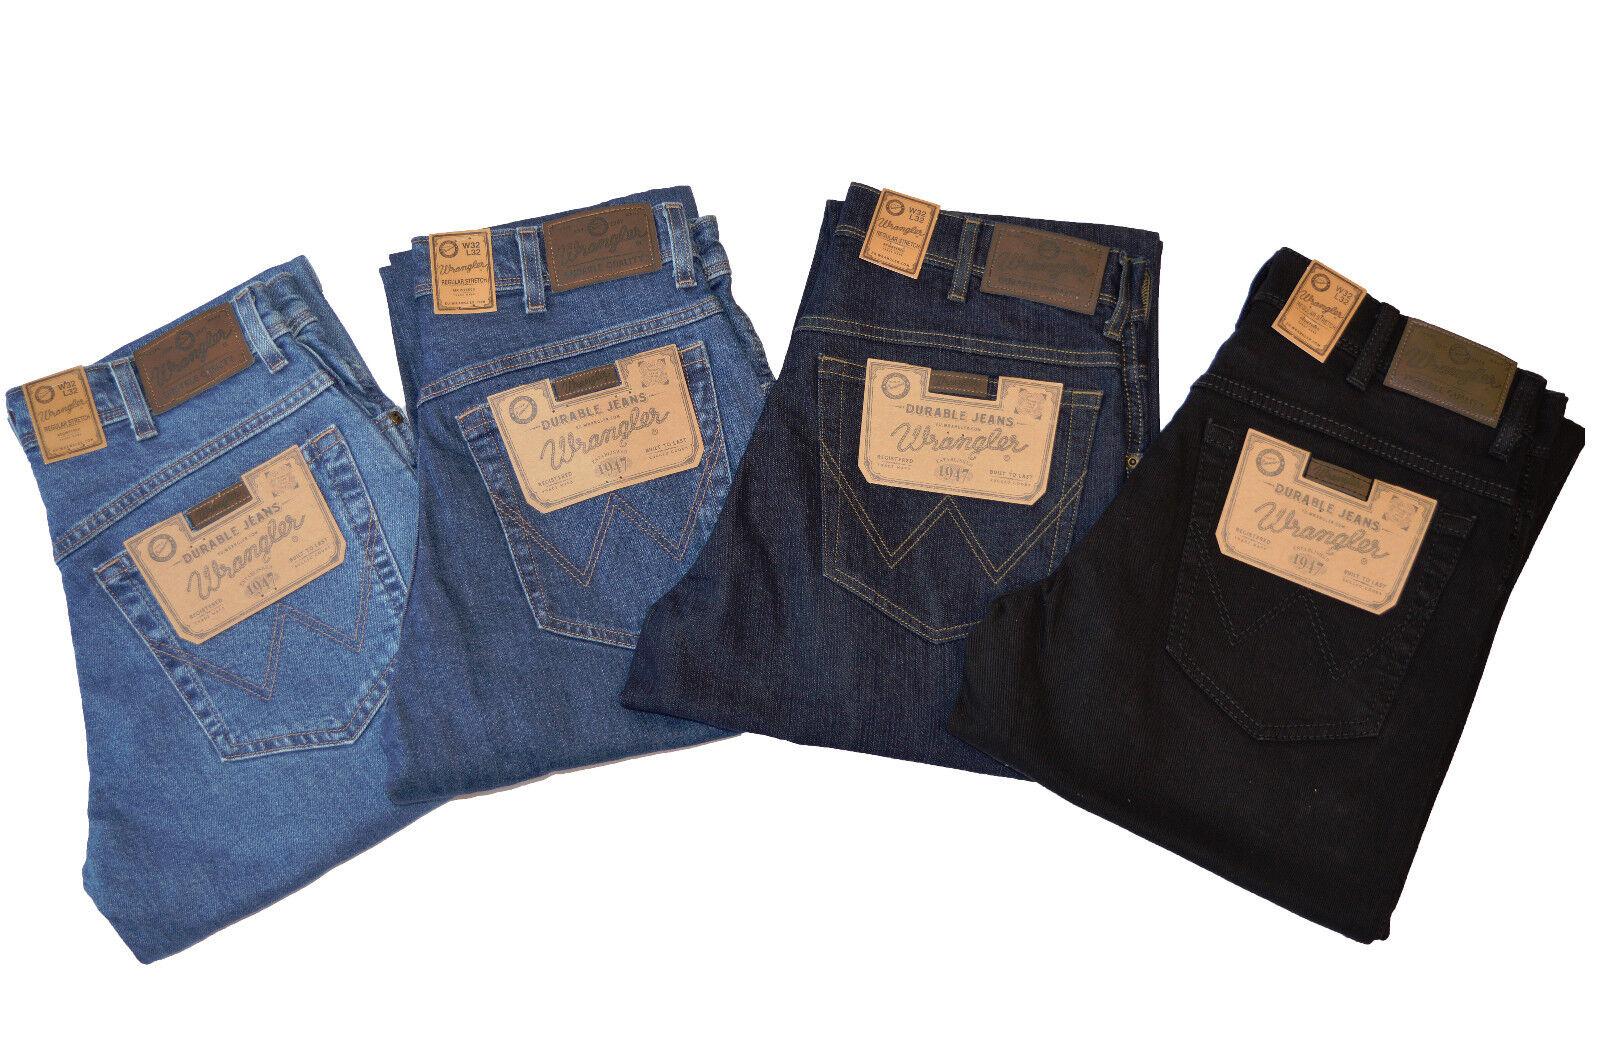 Wrangler Regular Fit Durable Stretch Men's Jeans Similar Texas all Sizes